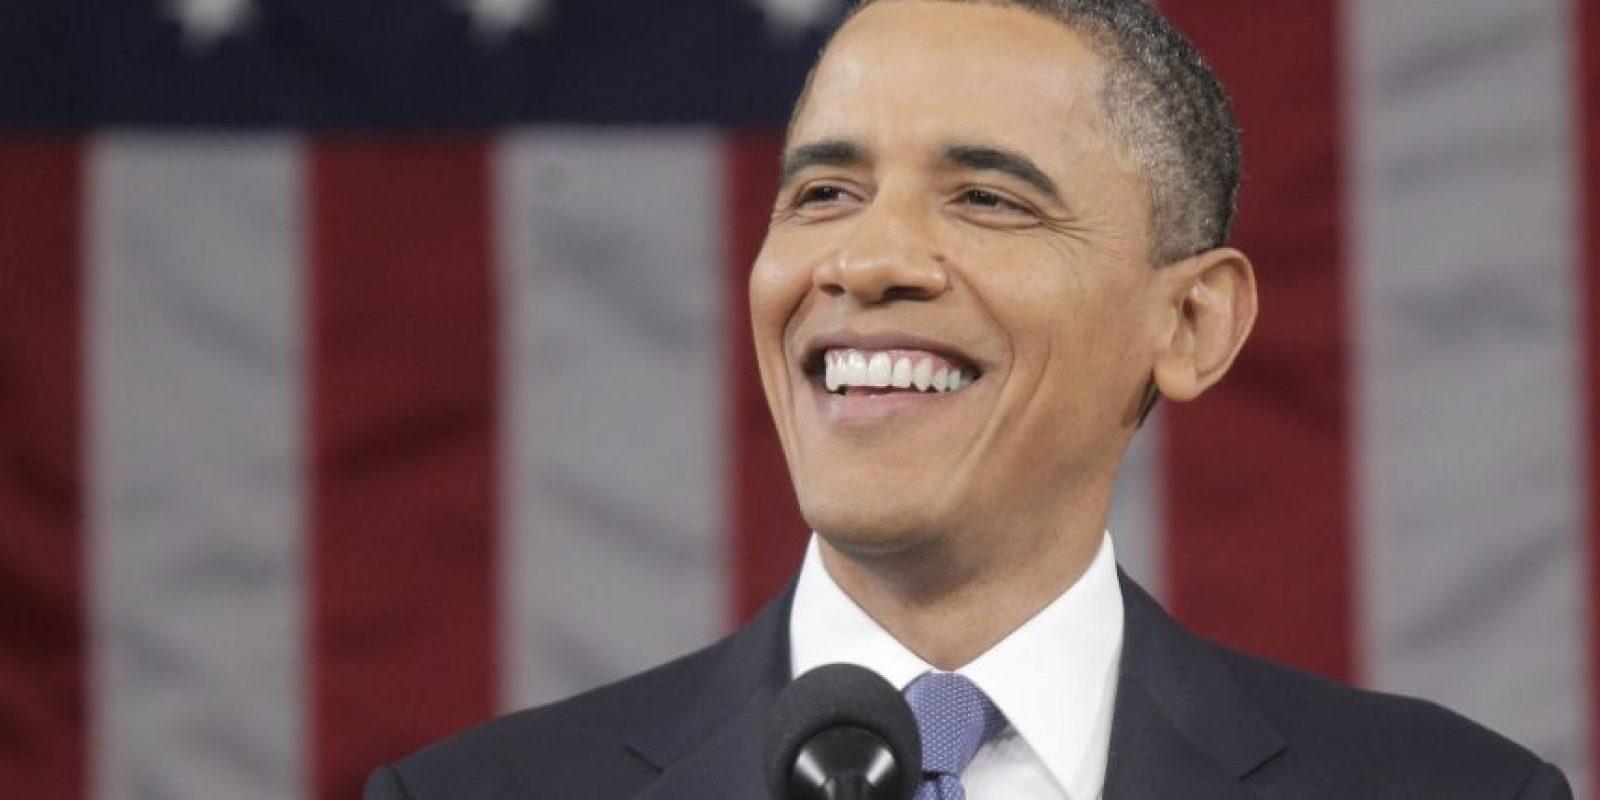 Para 2011, Obama mostraba ya indicios de pelo cano. Foto:Getty Images